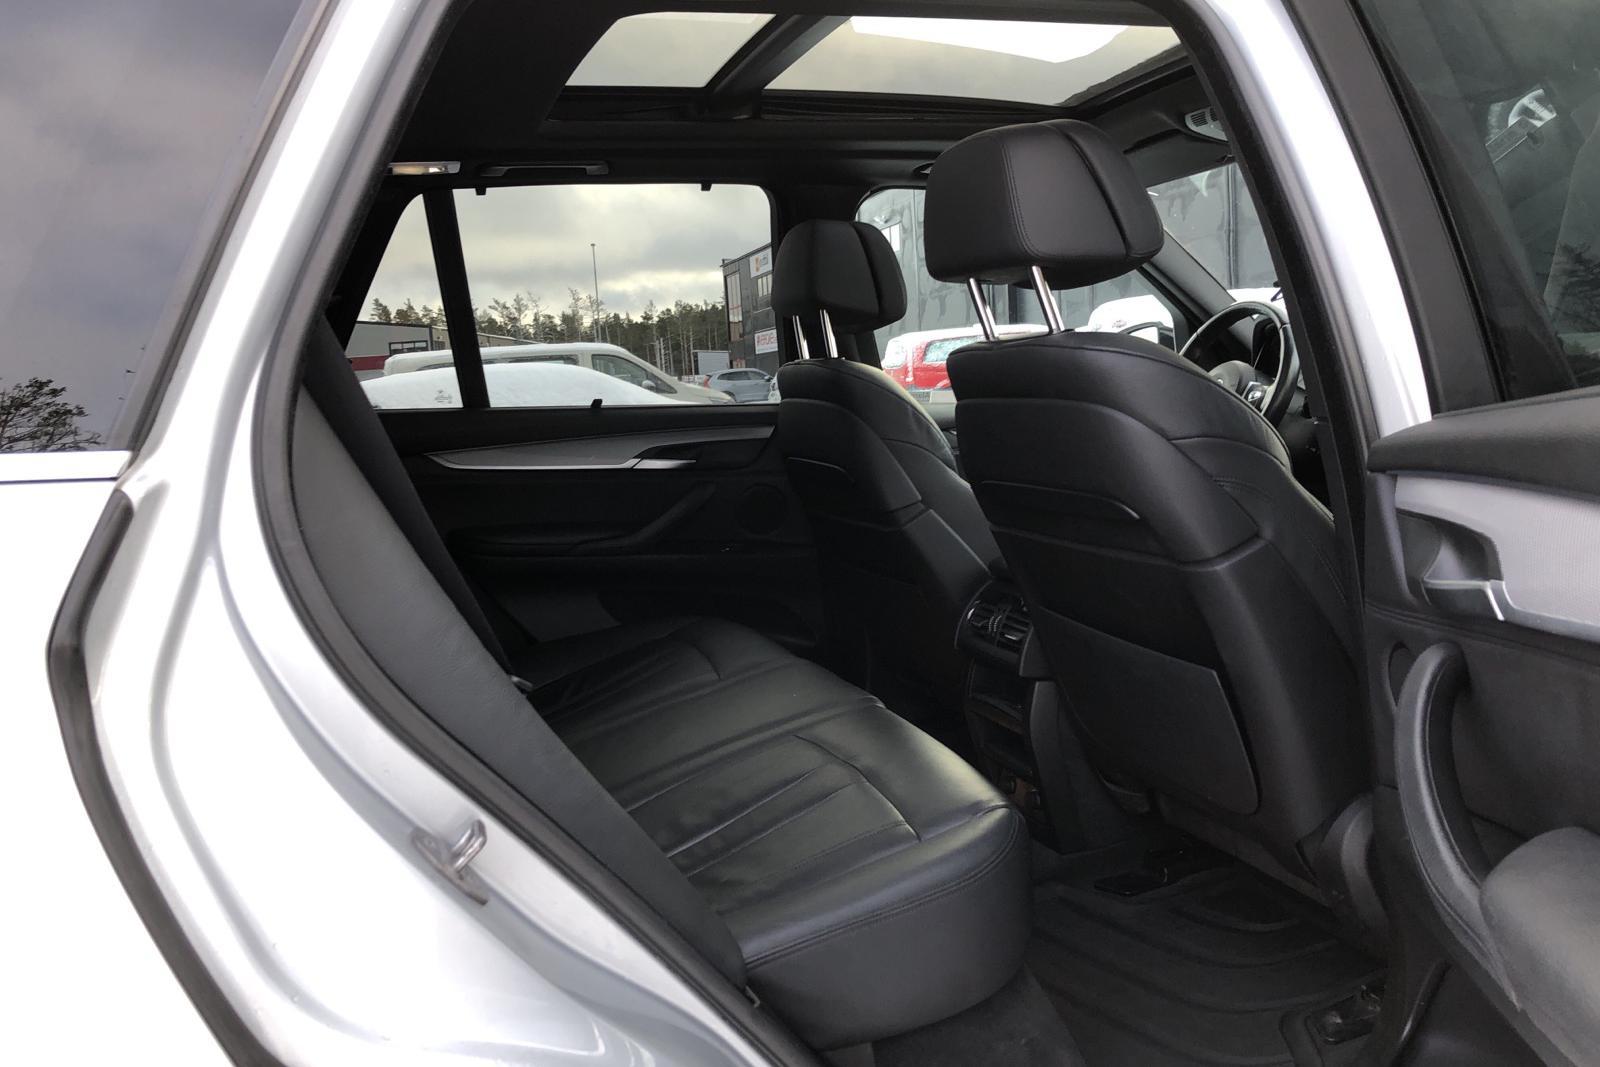 BMW X5 xDrive30d, F15 (258hk) - 139 630 km - Automatic - silver - 2014